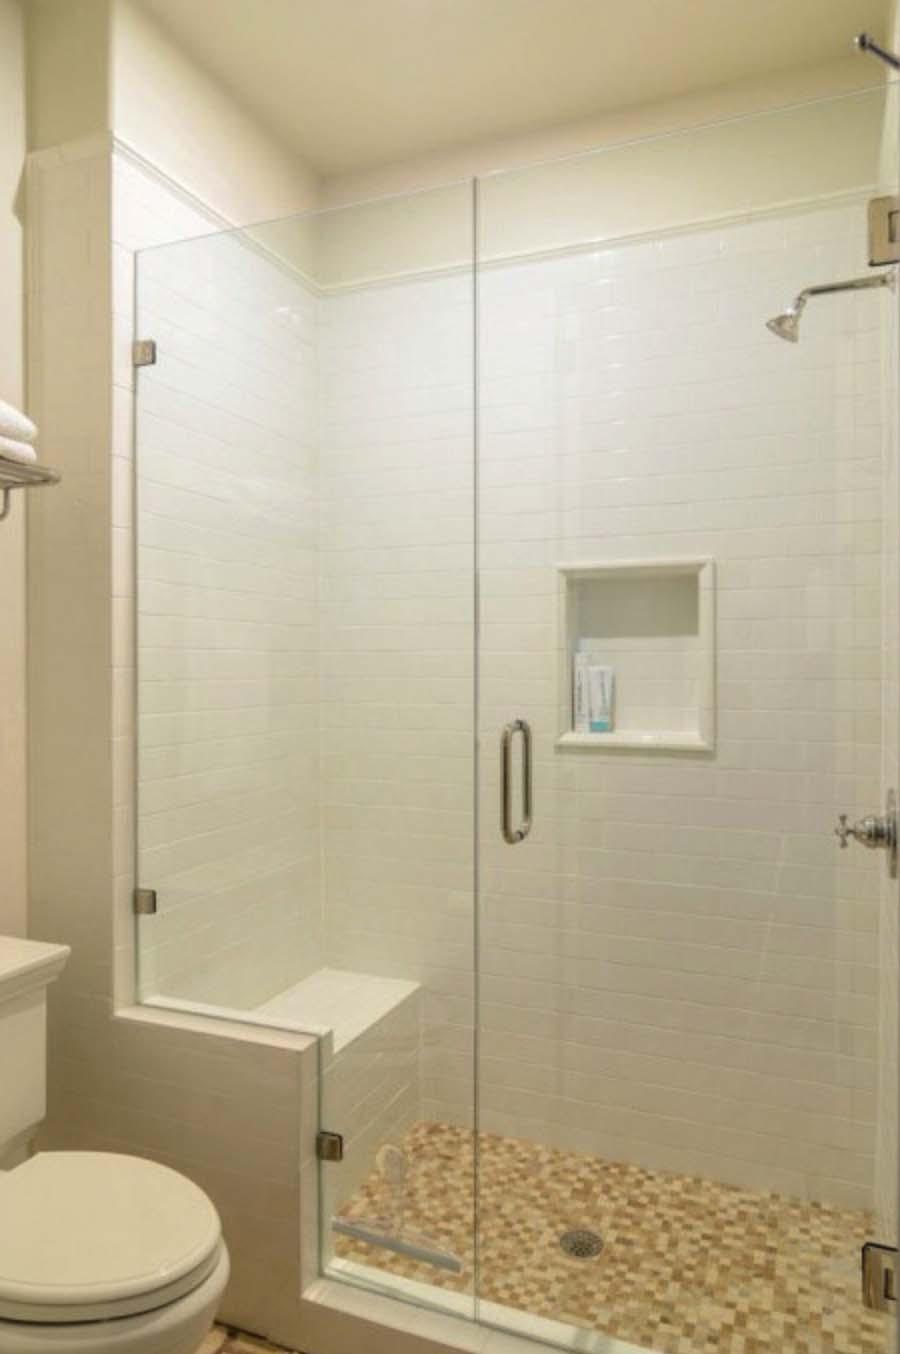 Rustic Mediterranean Style Home Design-20-1 Kindesign